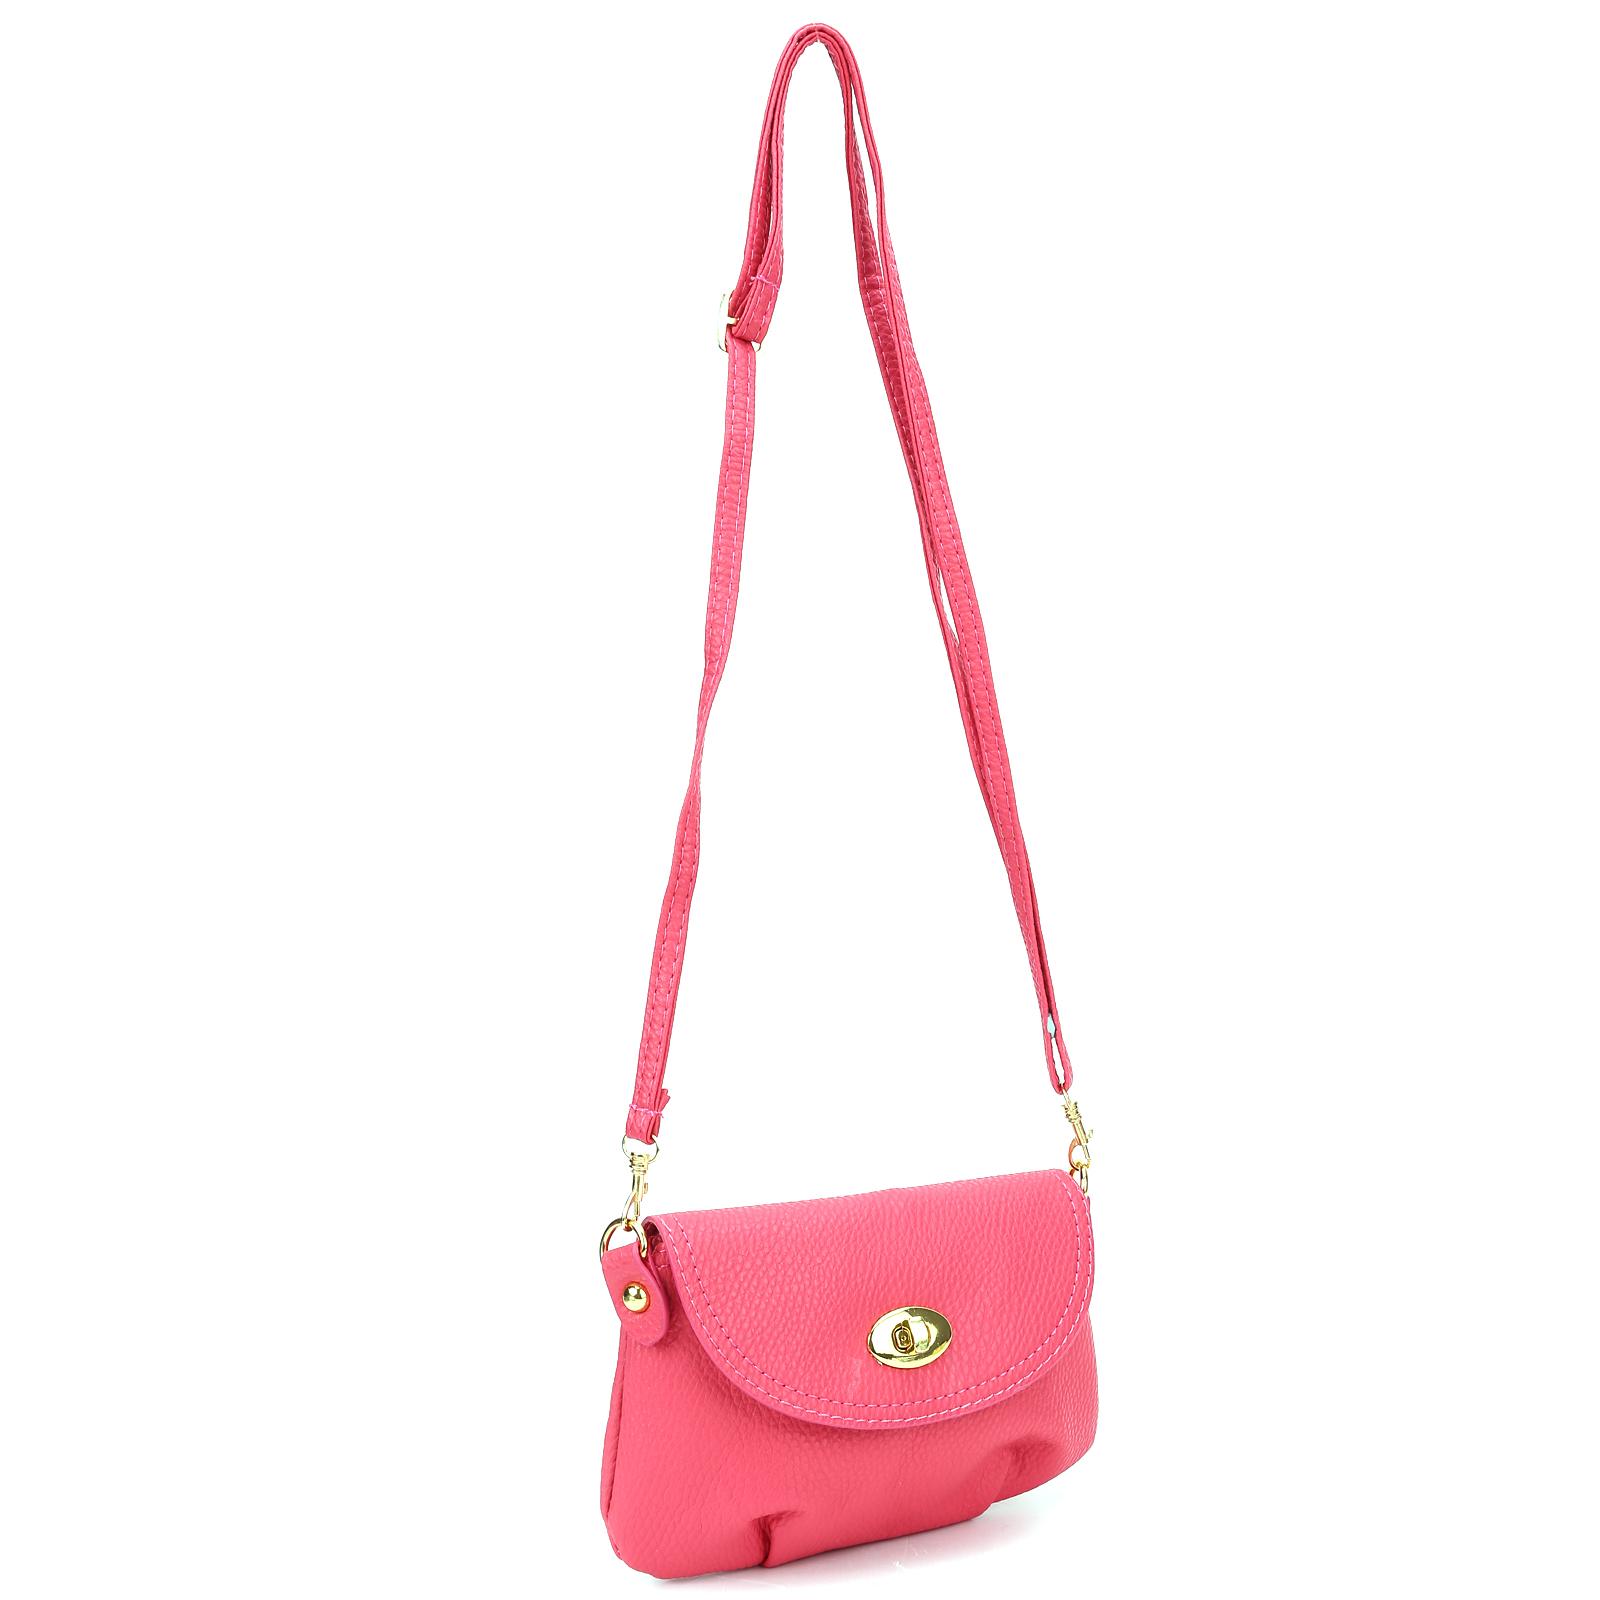 Pahajim Women PU leather Tote Bags Small Satchel Purses Shoulder Tassel Handbags. $ NEW COACH (F) SIGNATURE MINI BROOKE CARRYALL BROWN BLACK HANDBAG PURSE. $ New York Company Women's Bags & Handbags Size Small Black Leather Satchel .